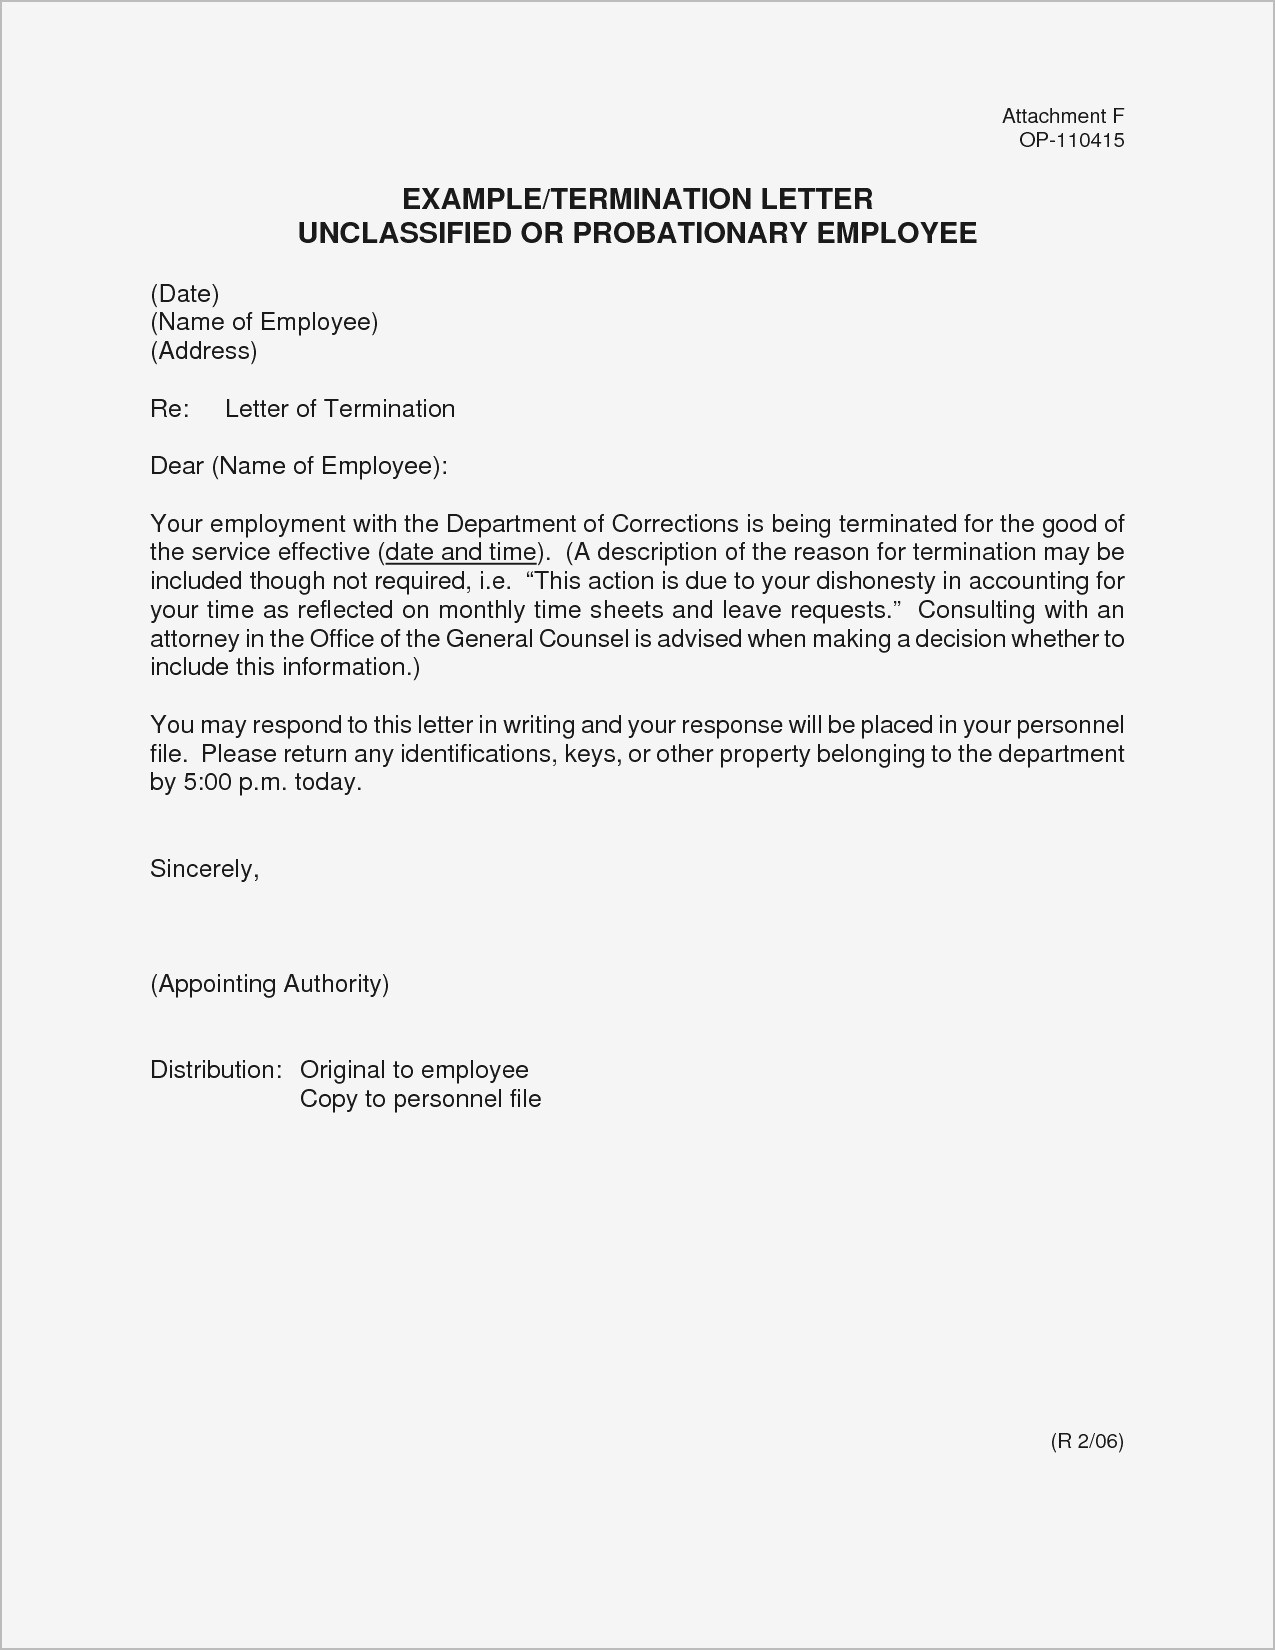 Dismissal Letter Template - Sample A Job Termination Letter New Example Termination Letter to